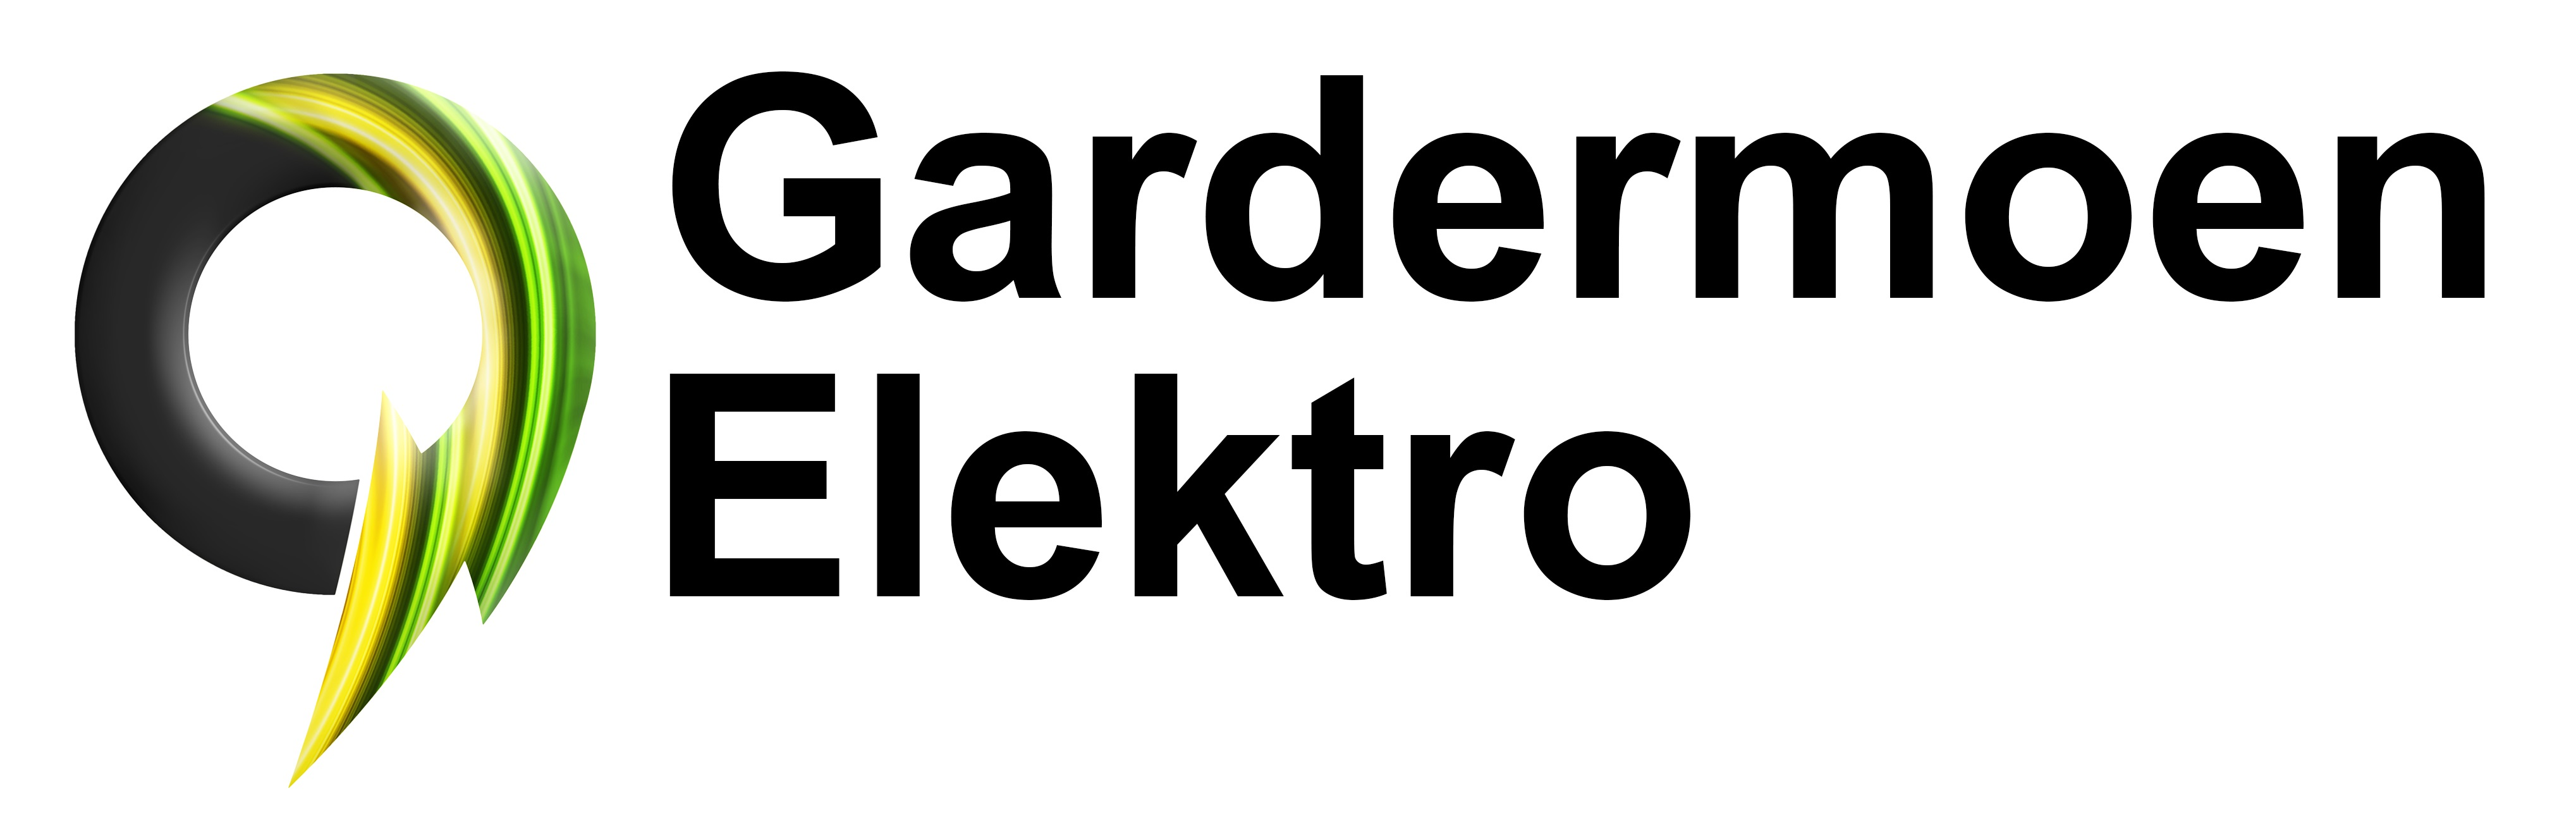 gardermoen-elektro-ladefabrikken